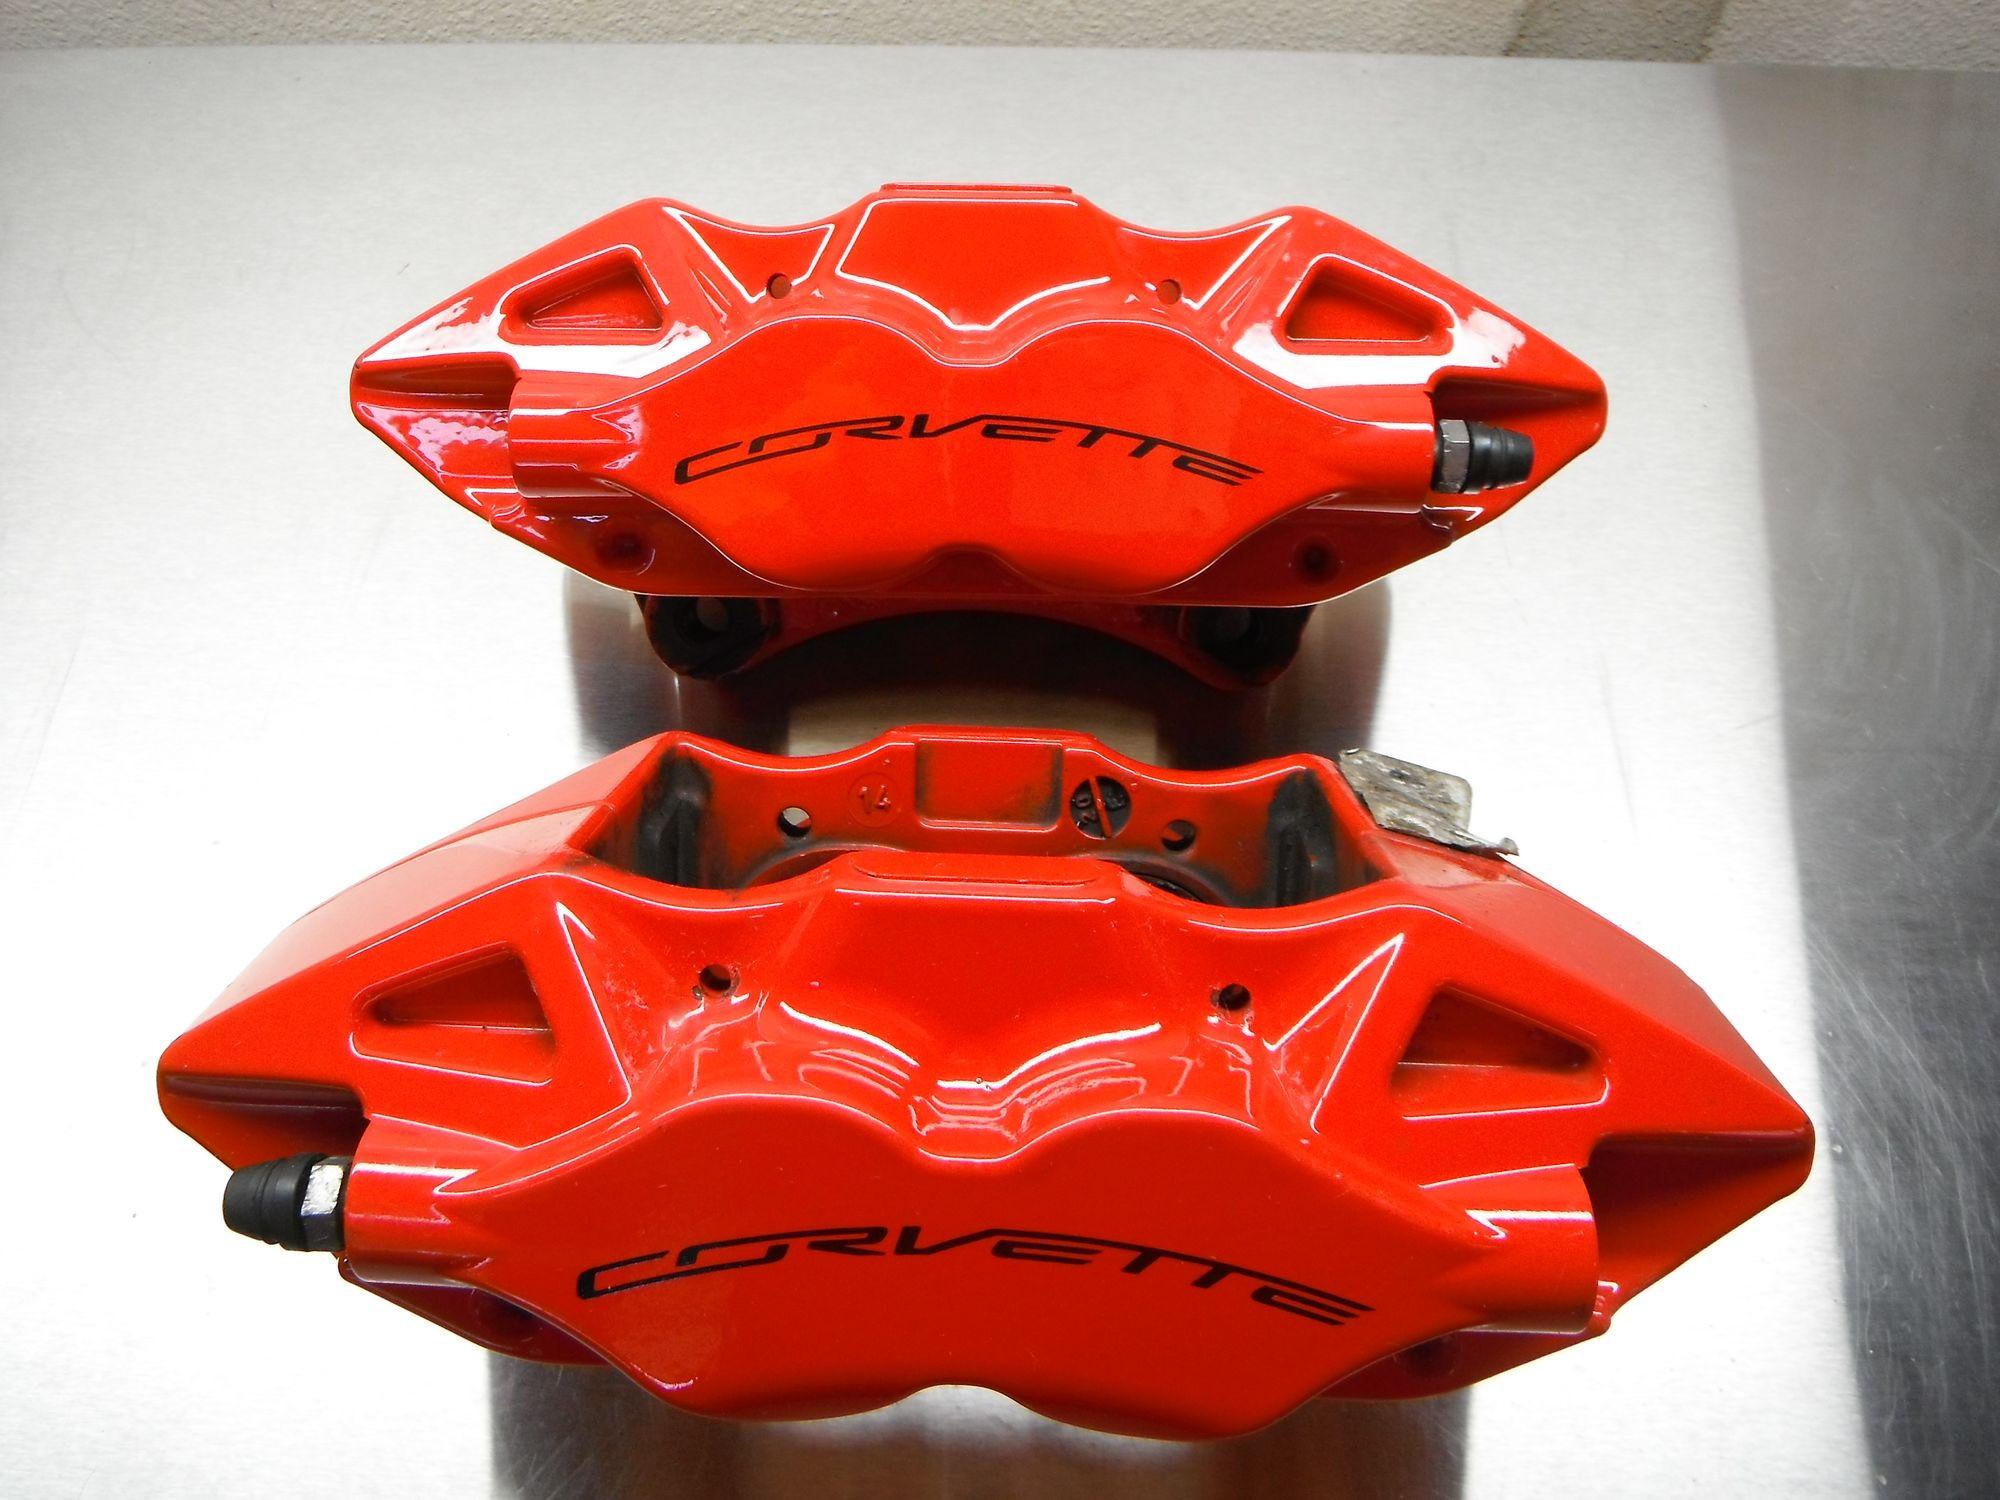 Brakes Plus Near Me >> FS (For Sale) Z51 Brake Kit, Red Calipers, Rotors, Pads, Hardware - CorvetteForum - Chevrolet ...